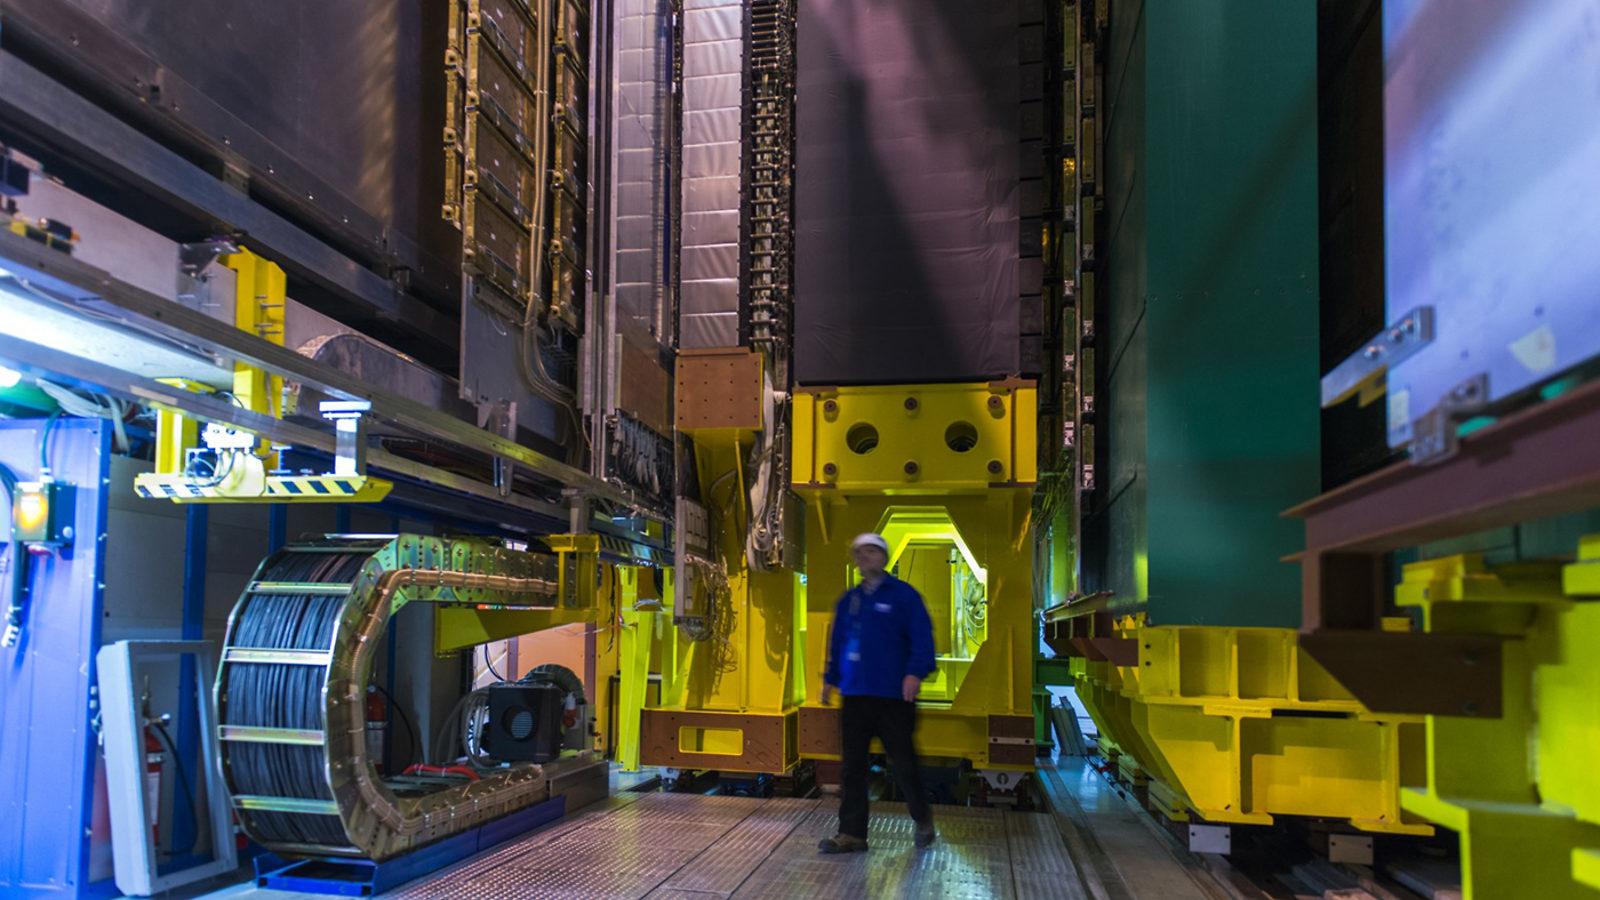 Photo: LHCb detector beneath